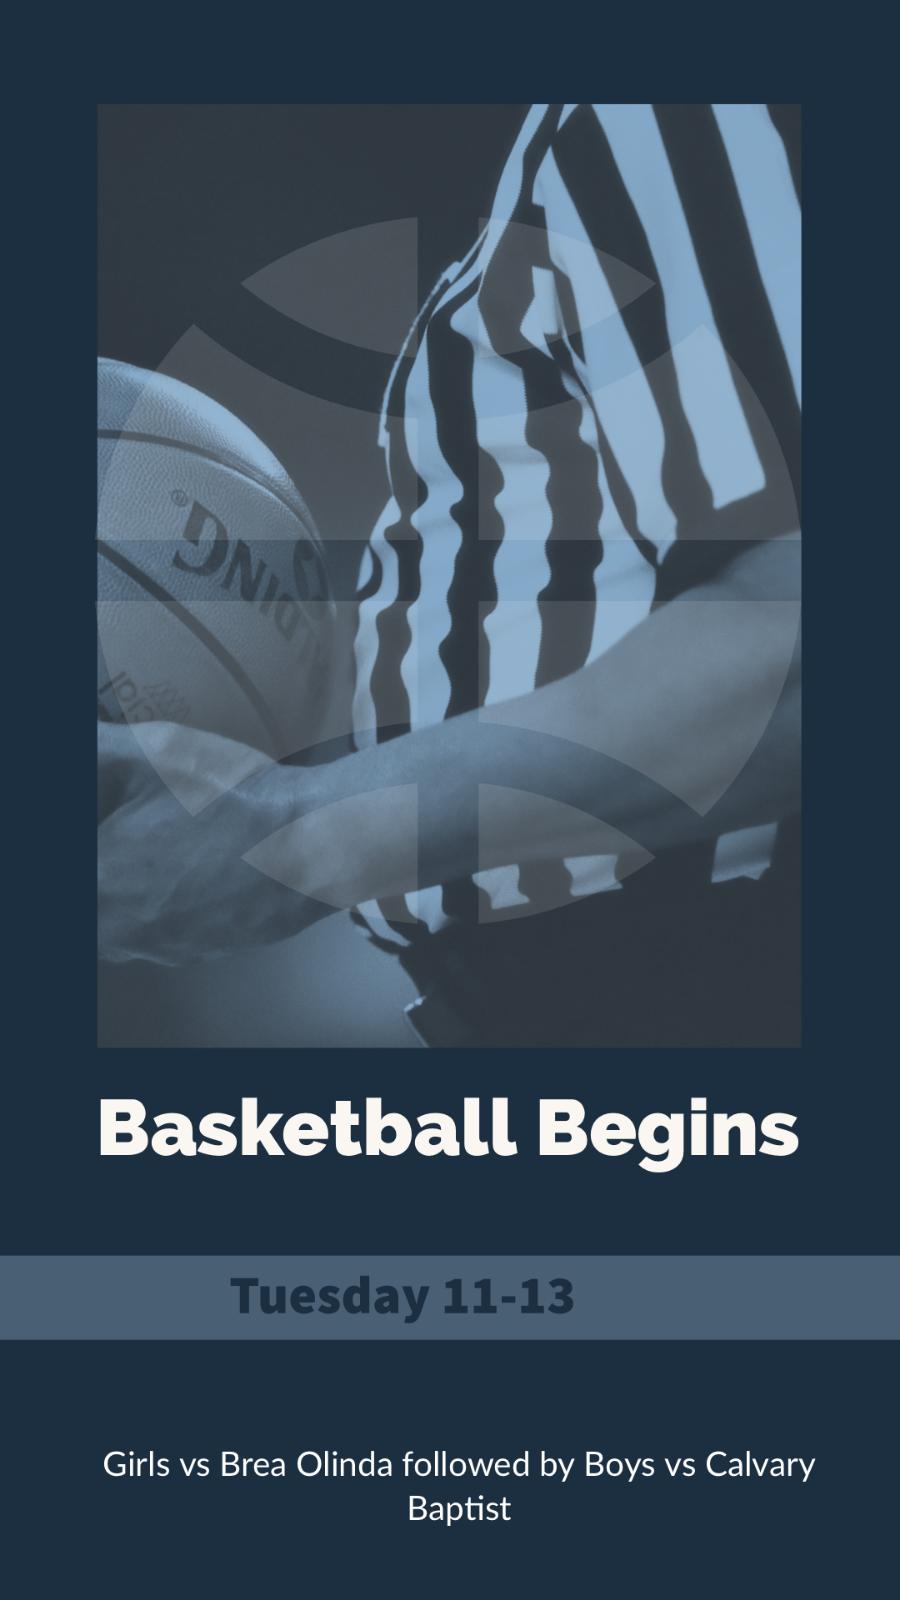 Basketball Season Begins Tuesday 11-13 with Home Games